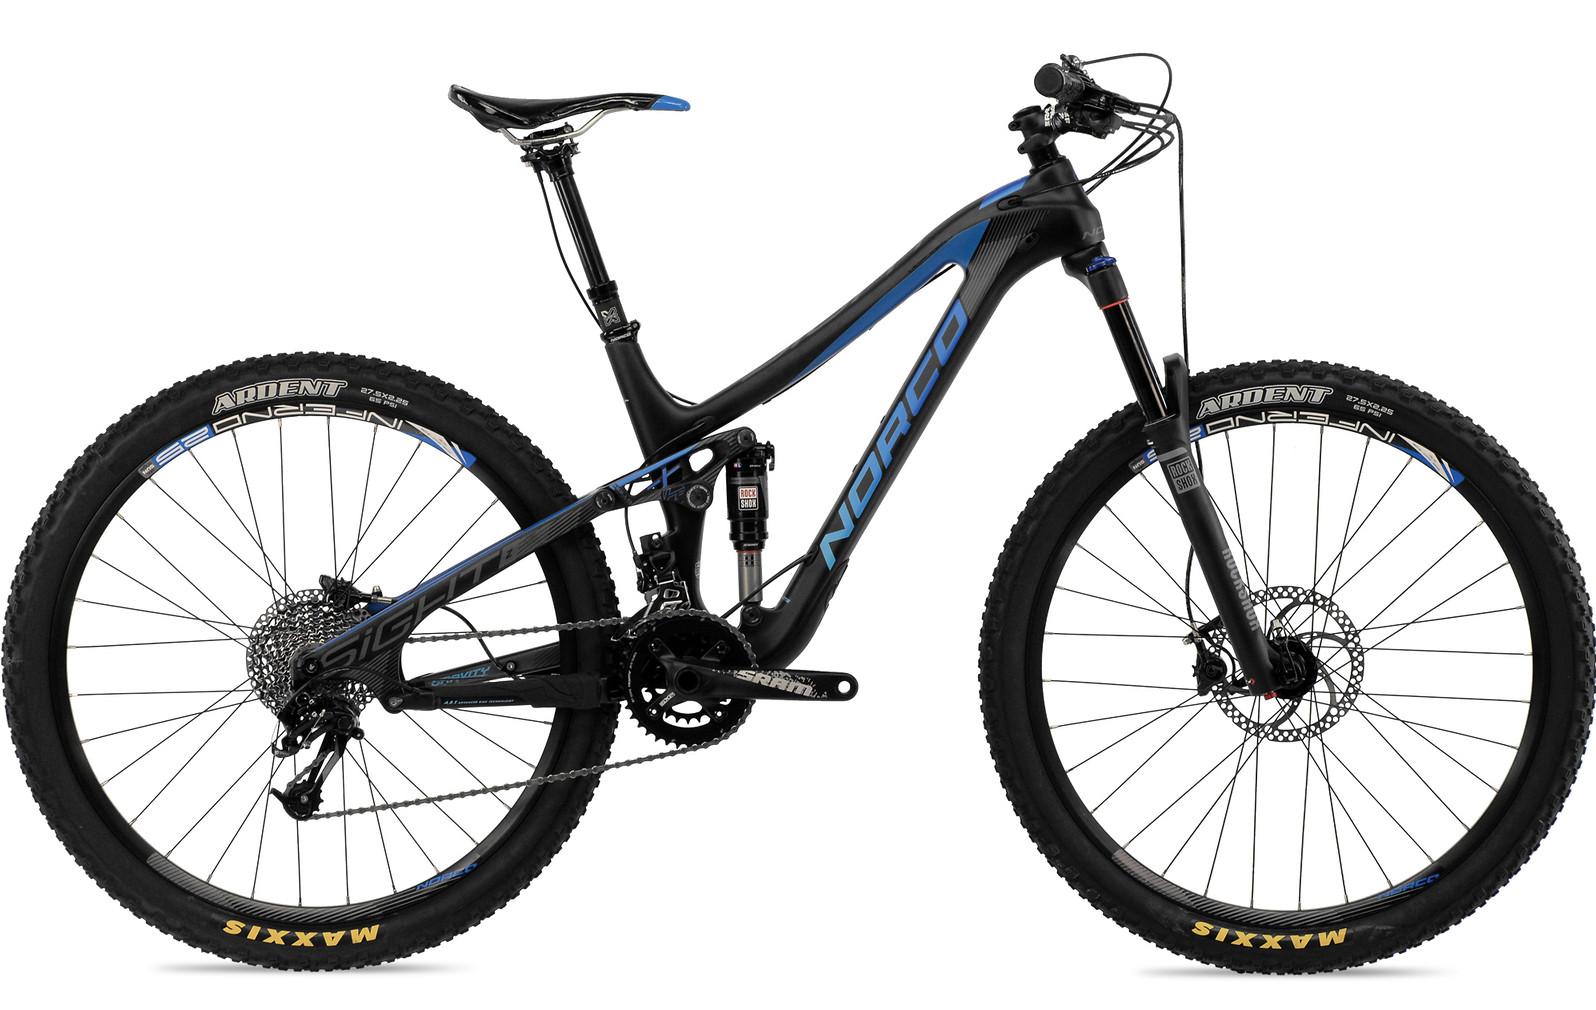 2014 Norco Sight Carbon 7.2 Bike